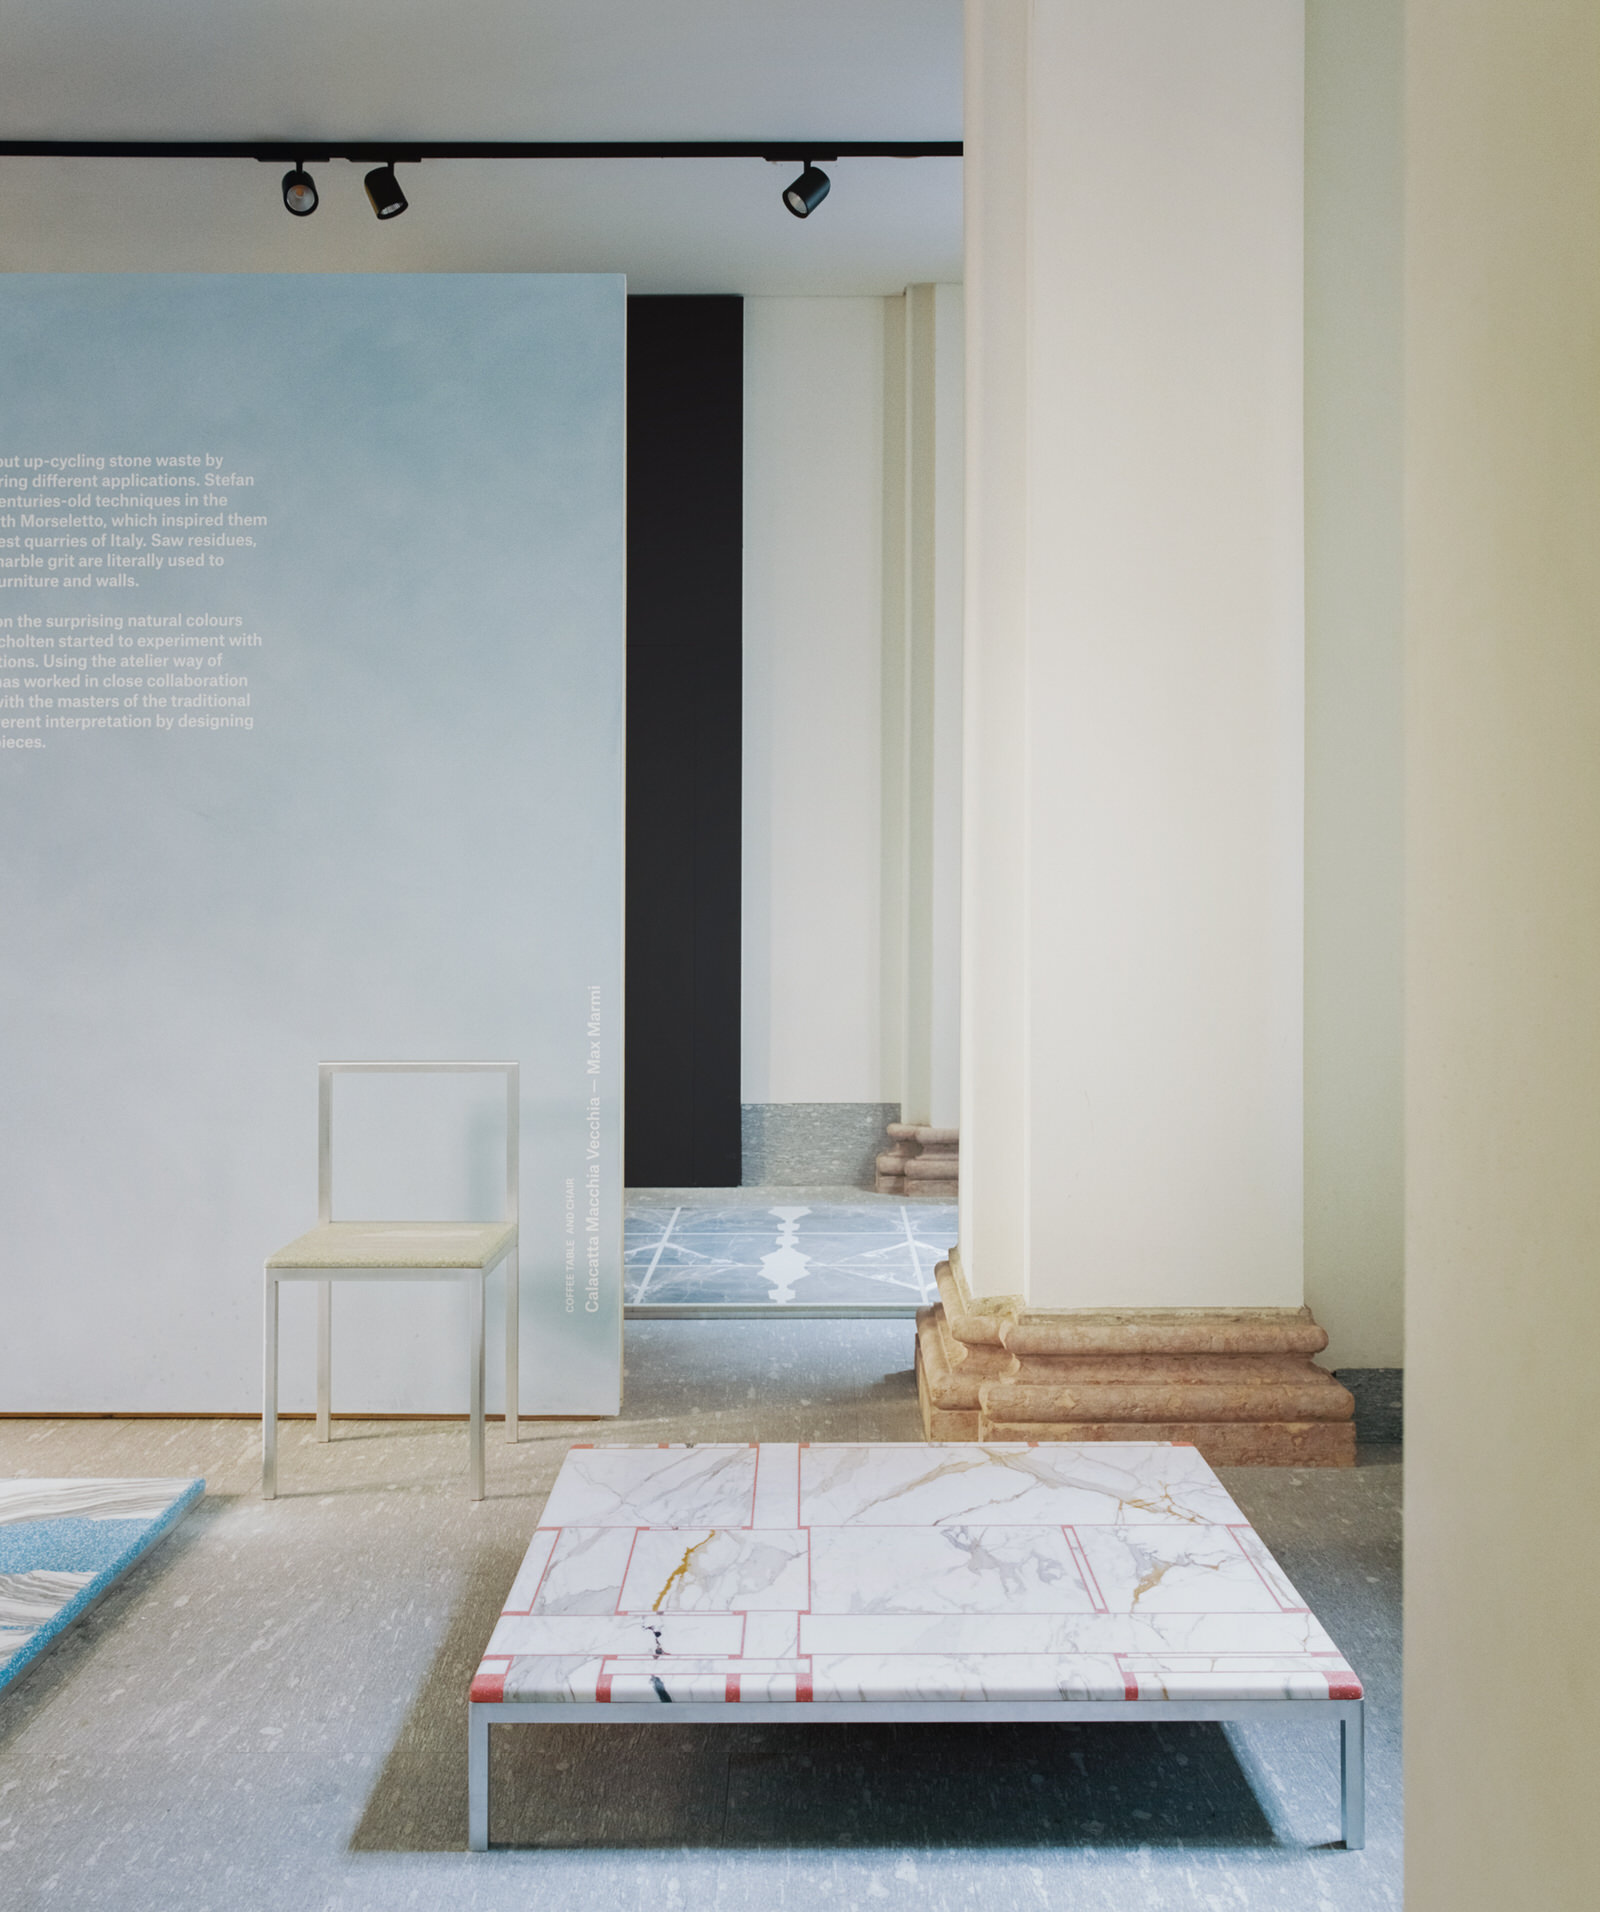 Stefan Scholten The Stone House Masterly Palazzo Turati Milan Design Week 2021 Photo Simone Bossi Yellowtrace 01